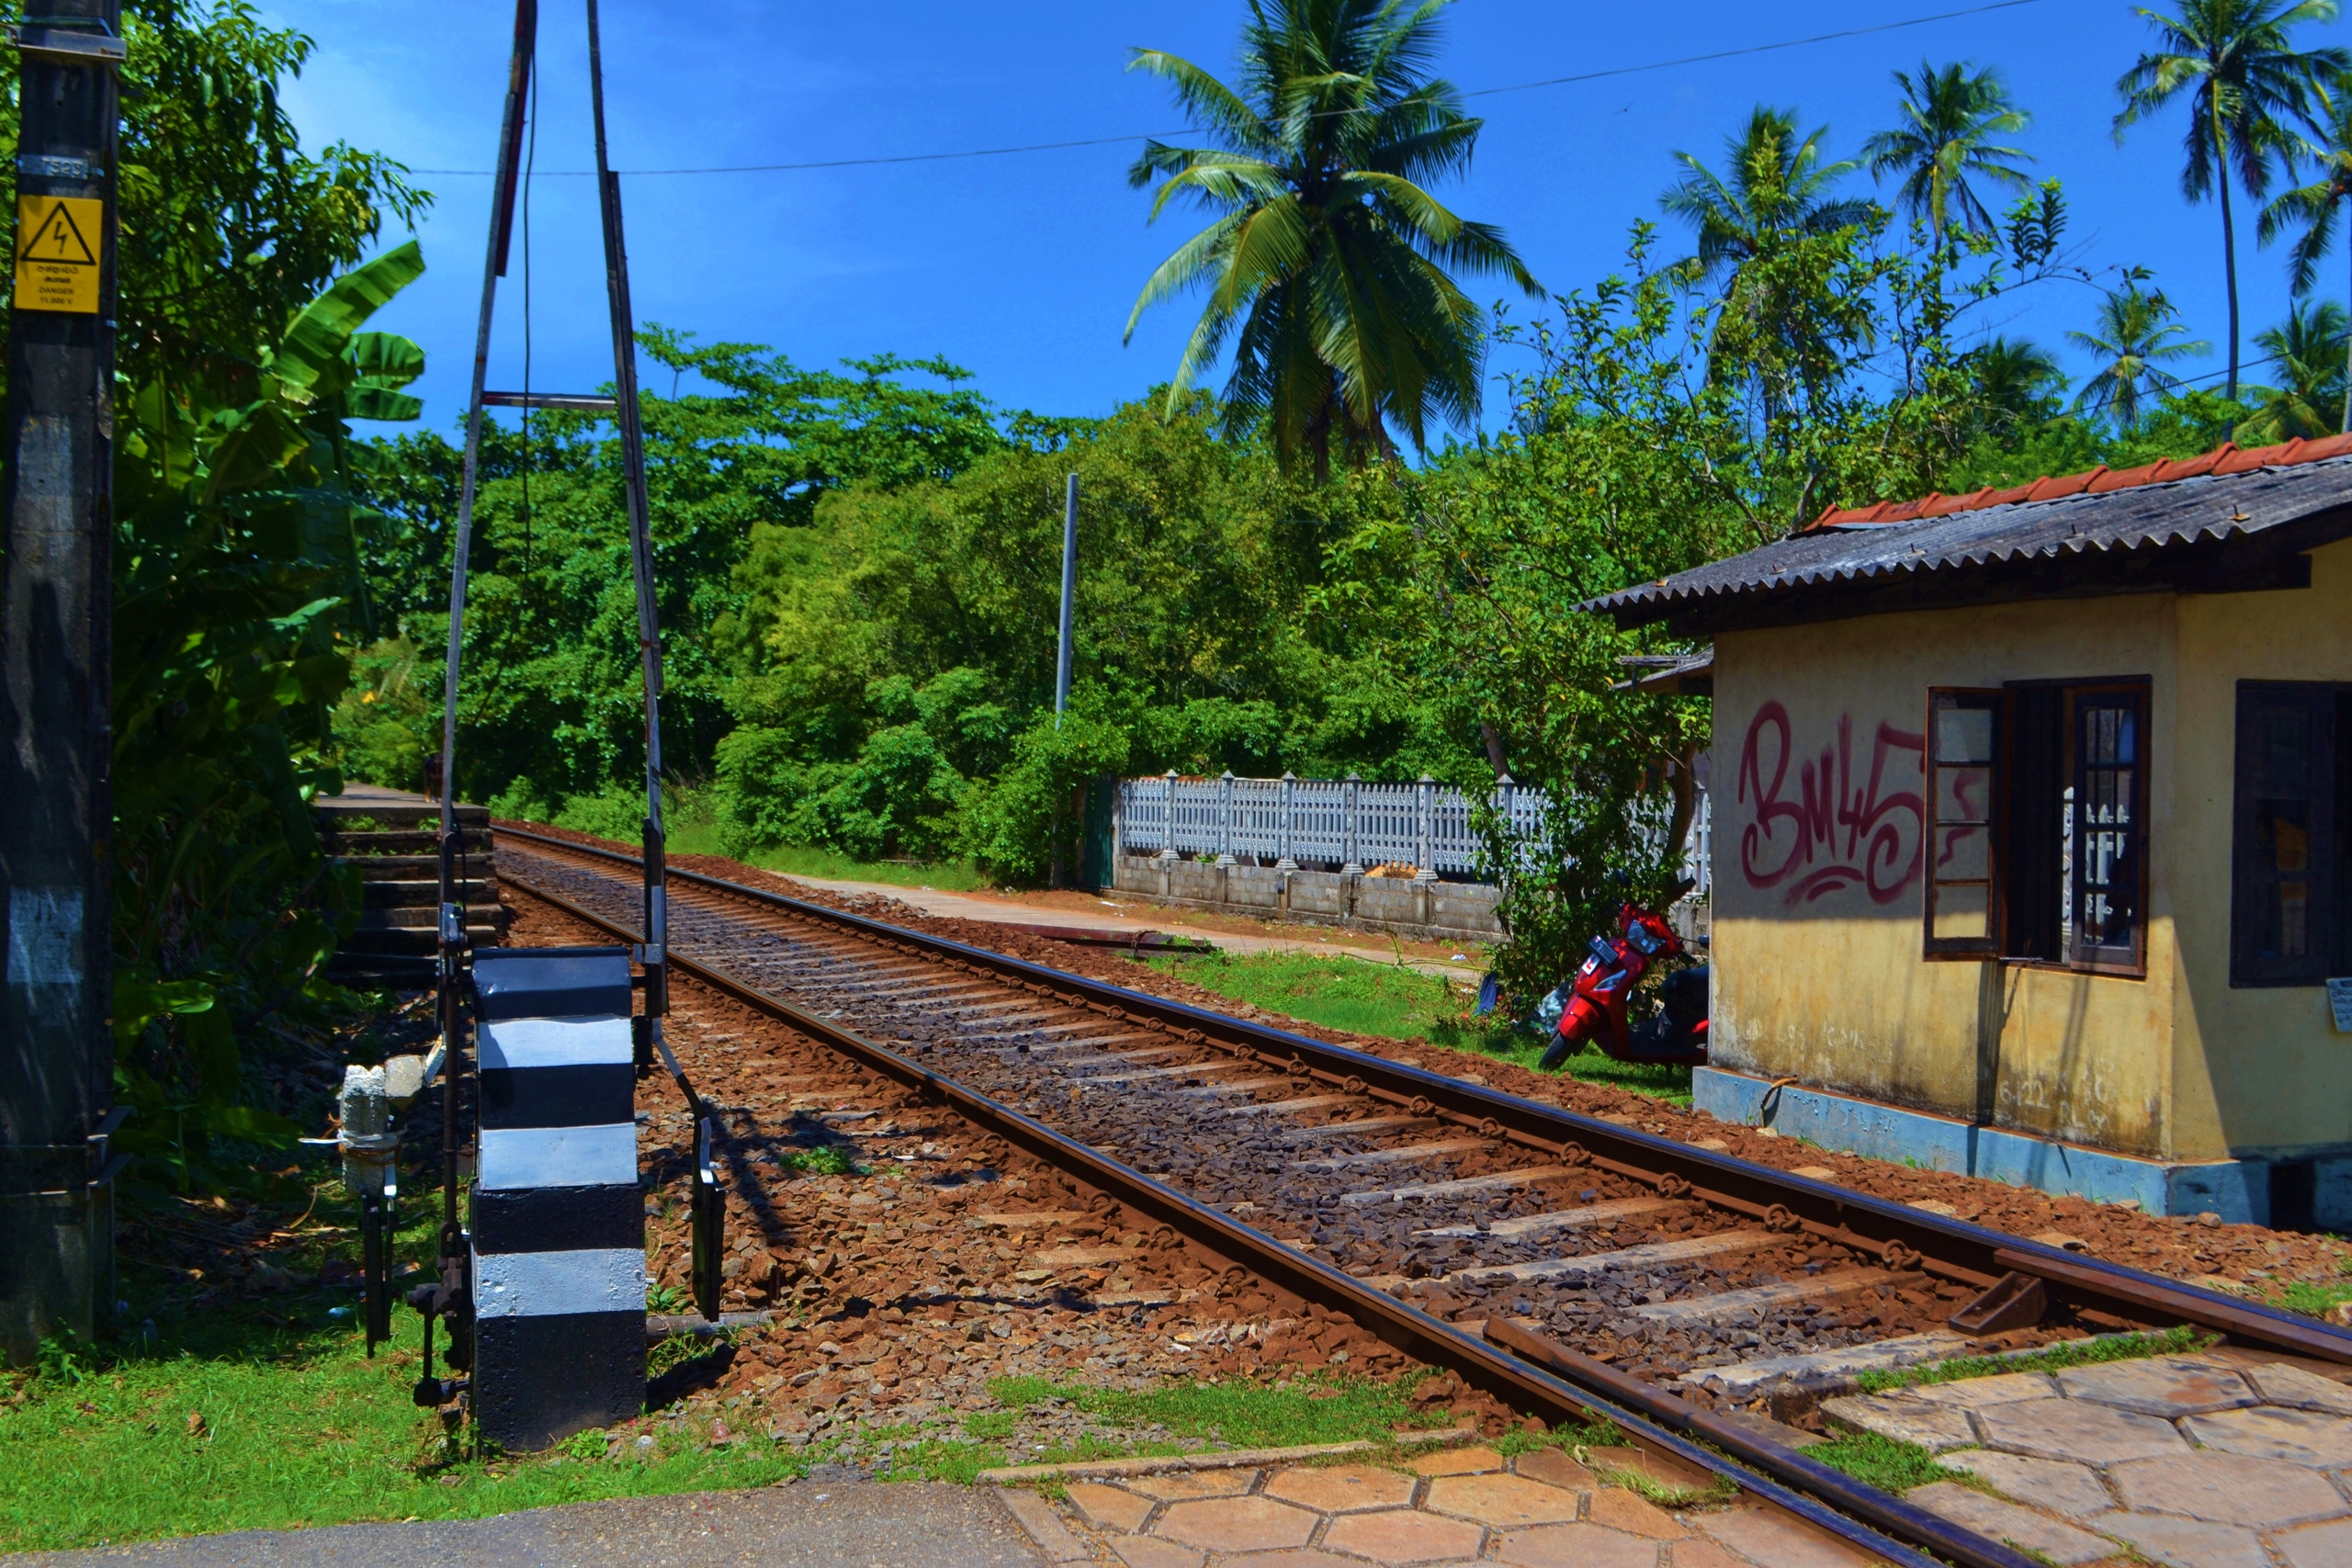 Шри Ланка (фото) - Страница 2 LdwD2Cdfyog